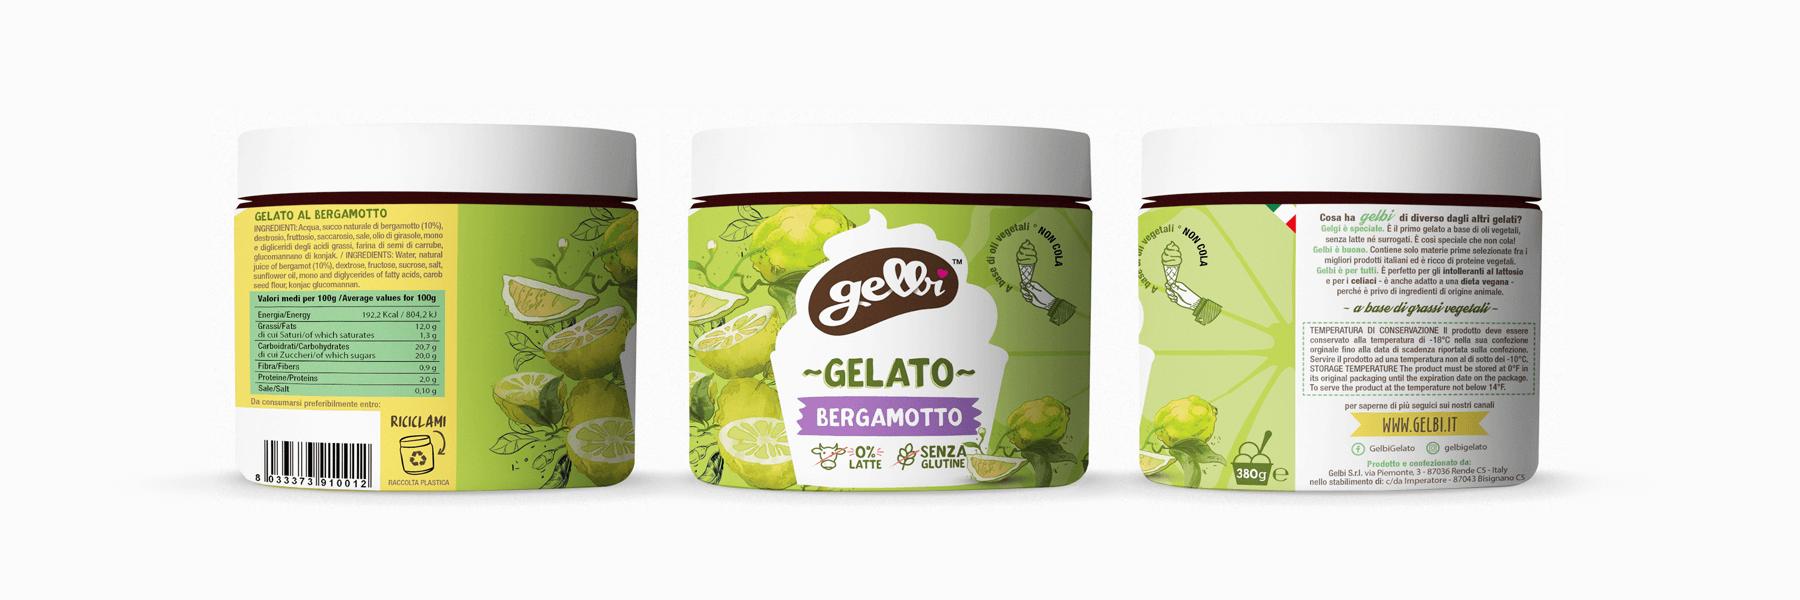 Studio La Regina - gelato Gelbi al bergamotto